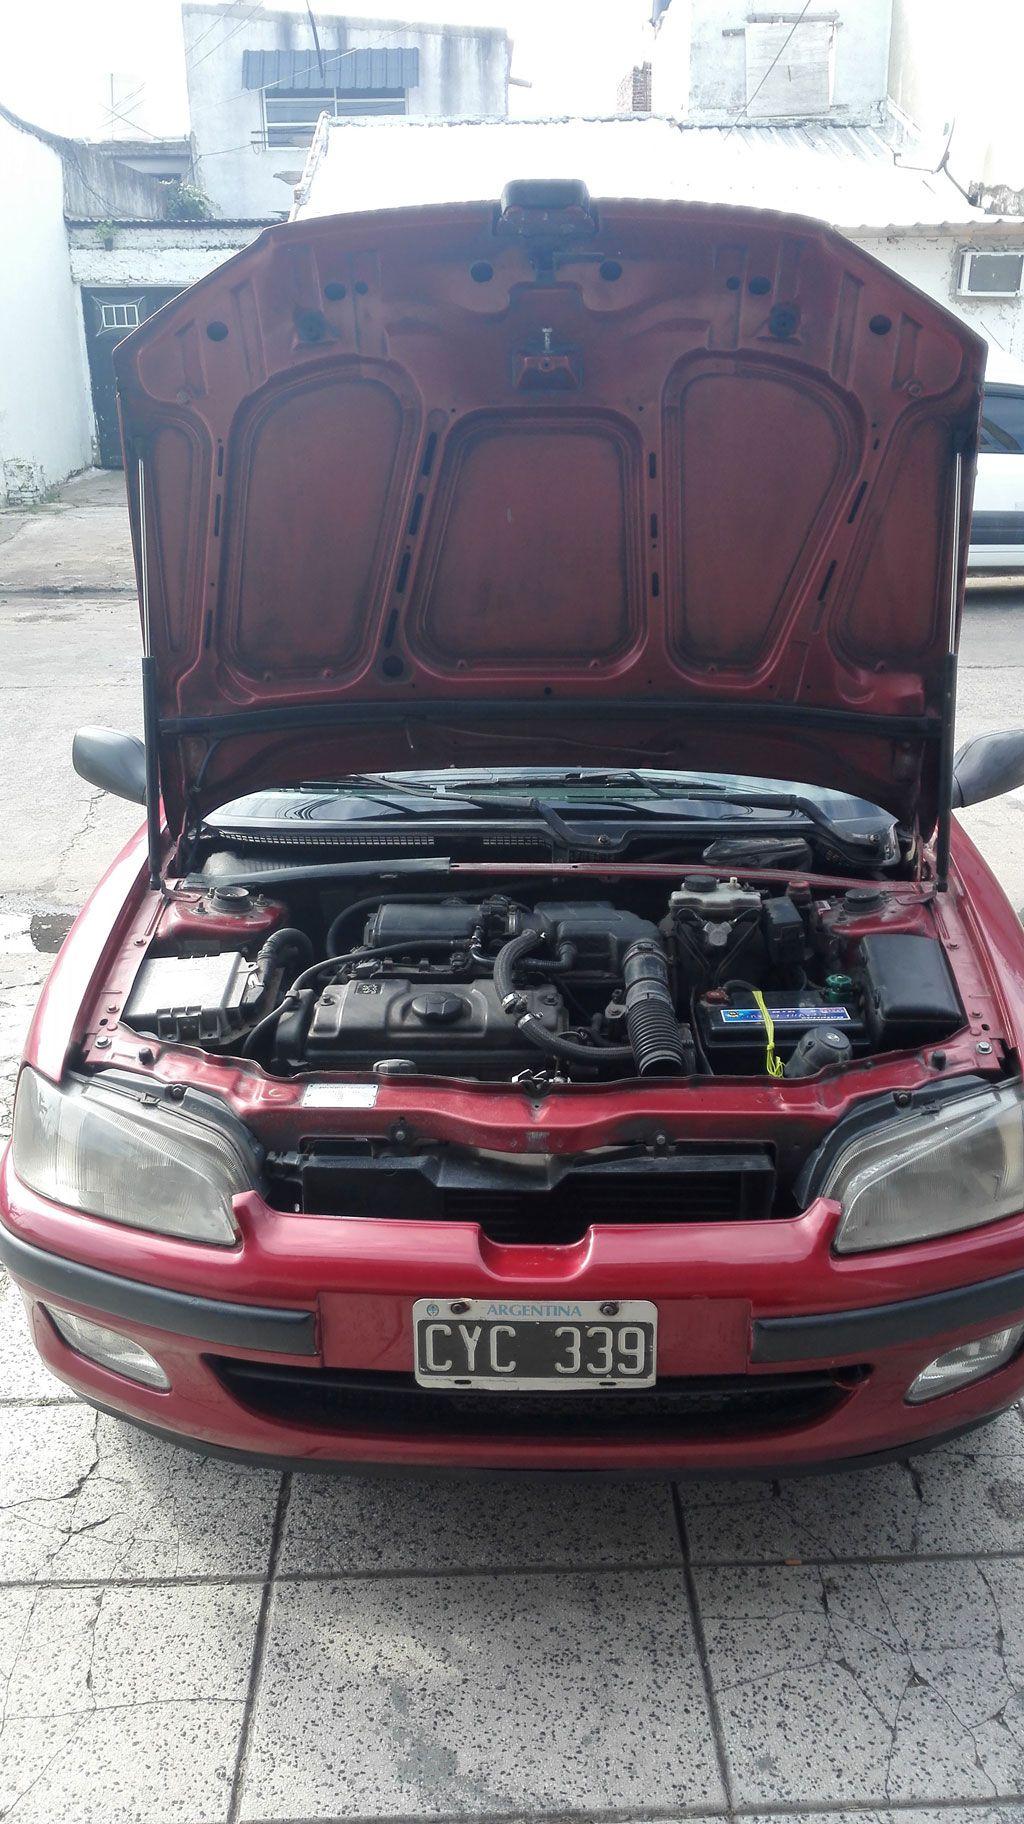 Index Of Img Yamaha Yzf R15 2016 27 Oct 2015 1739 321k 21 May 2018 1128 316k Chevrolet Corsa Comb 12 Nov 2014 1841 311k Mercedes Benz 16203